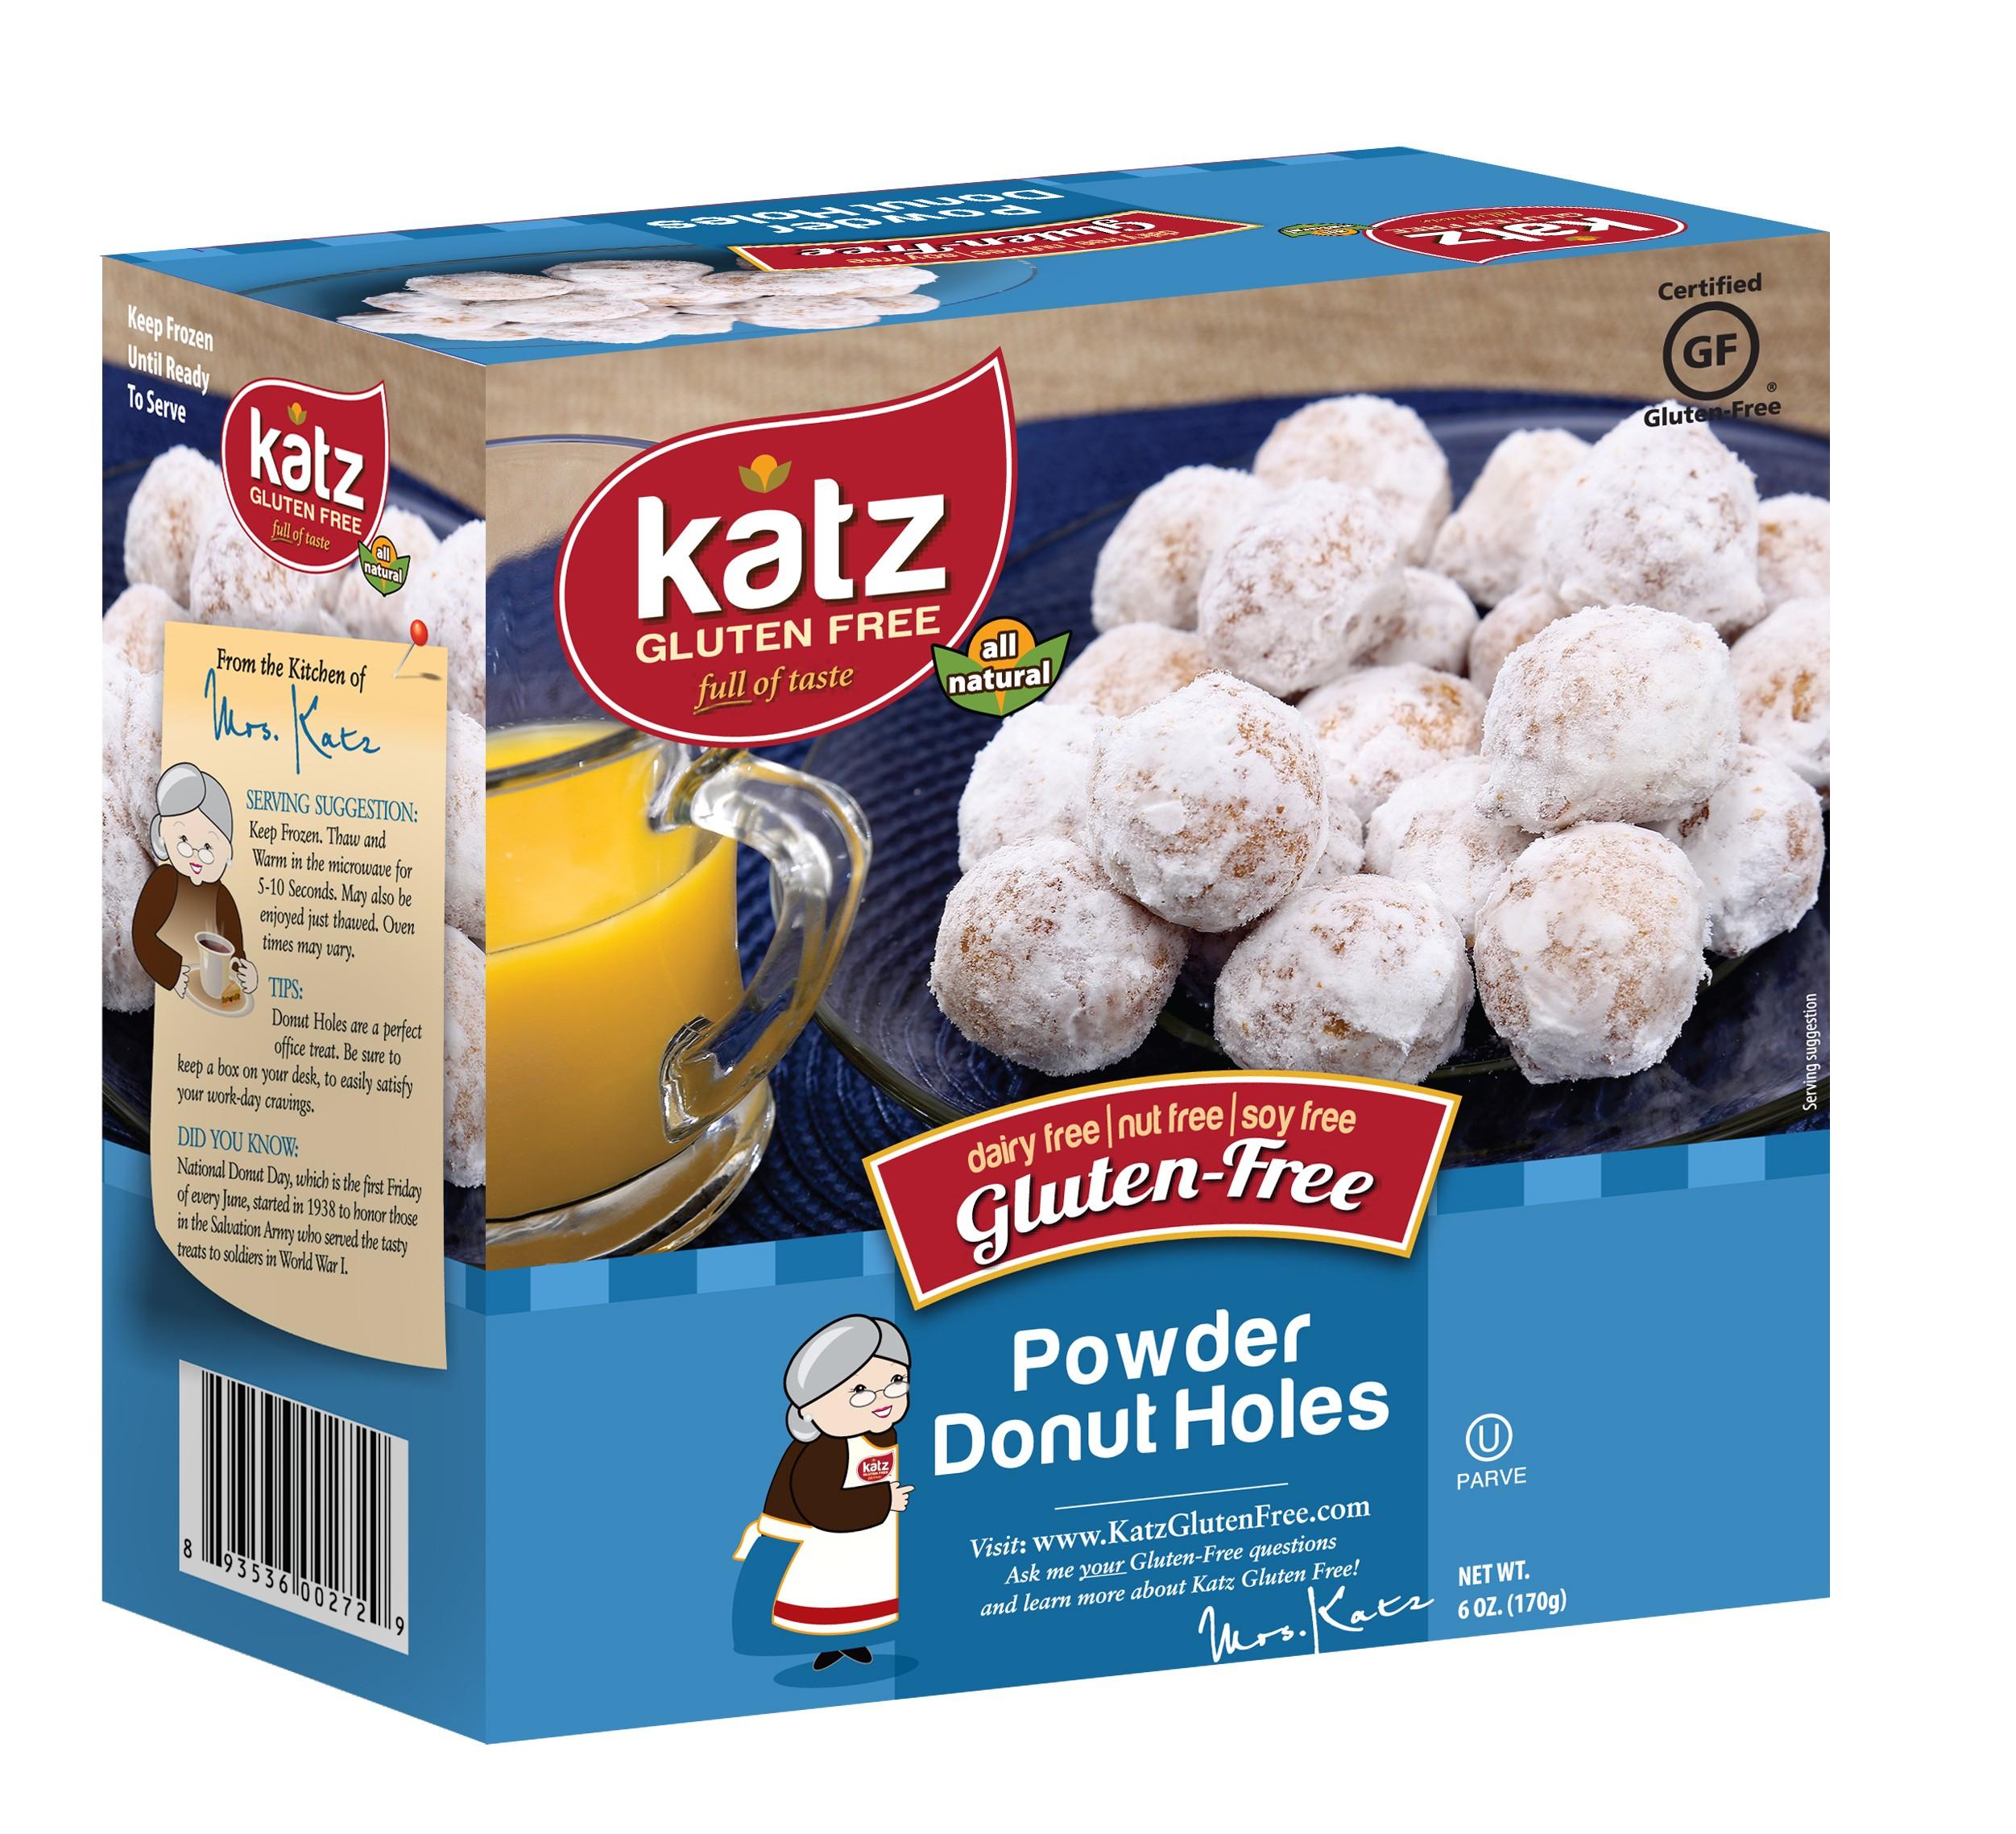 Katz Gluten Free Powdered Donut Holes [Case of 6]